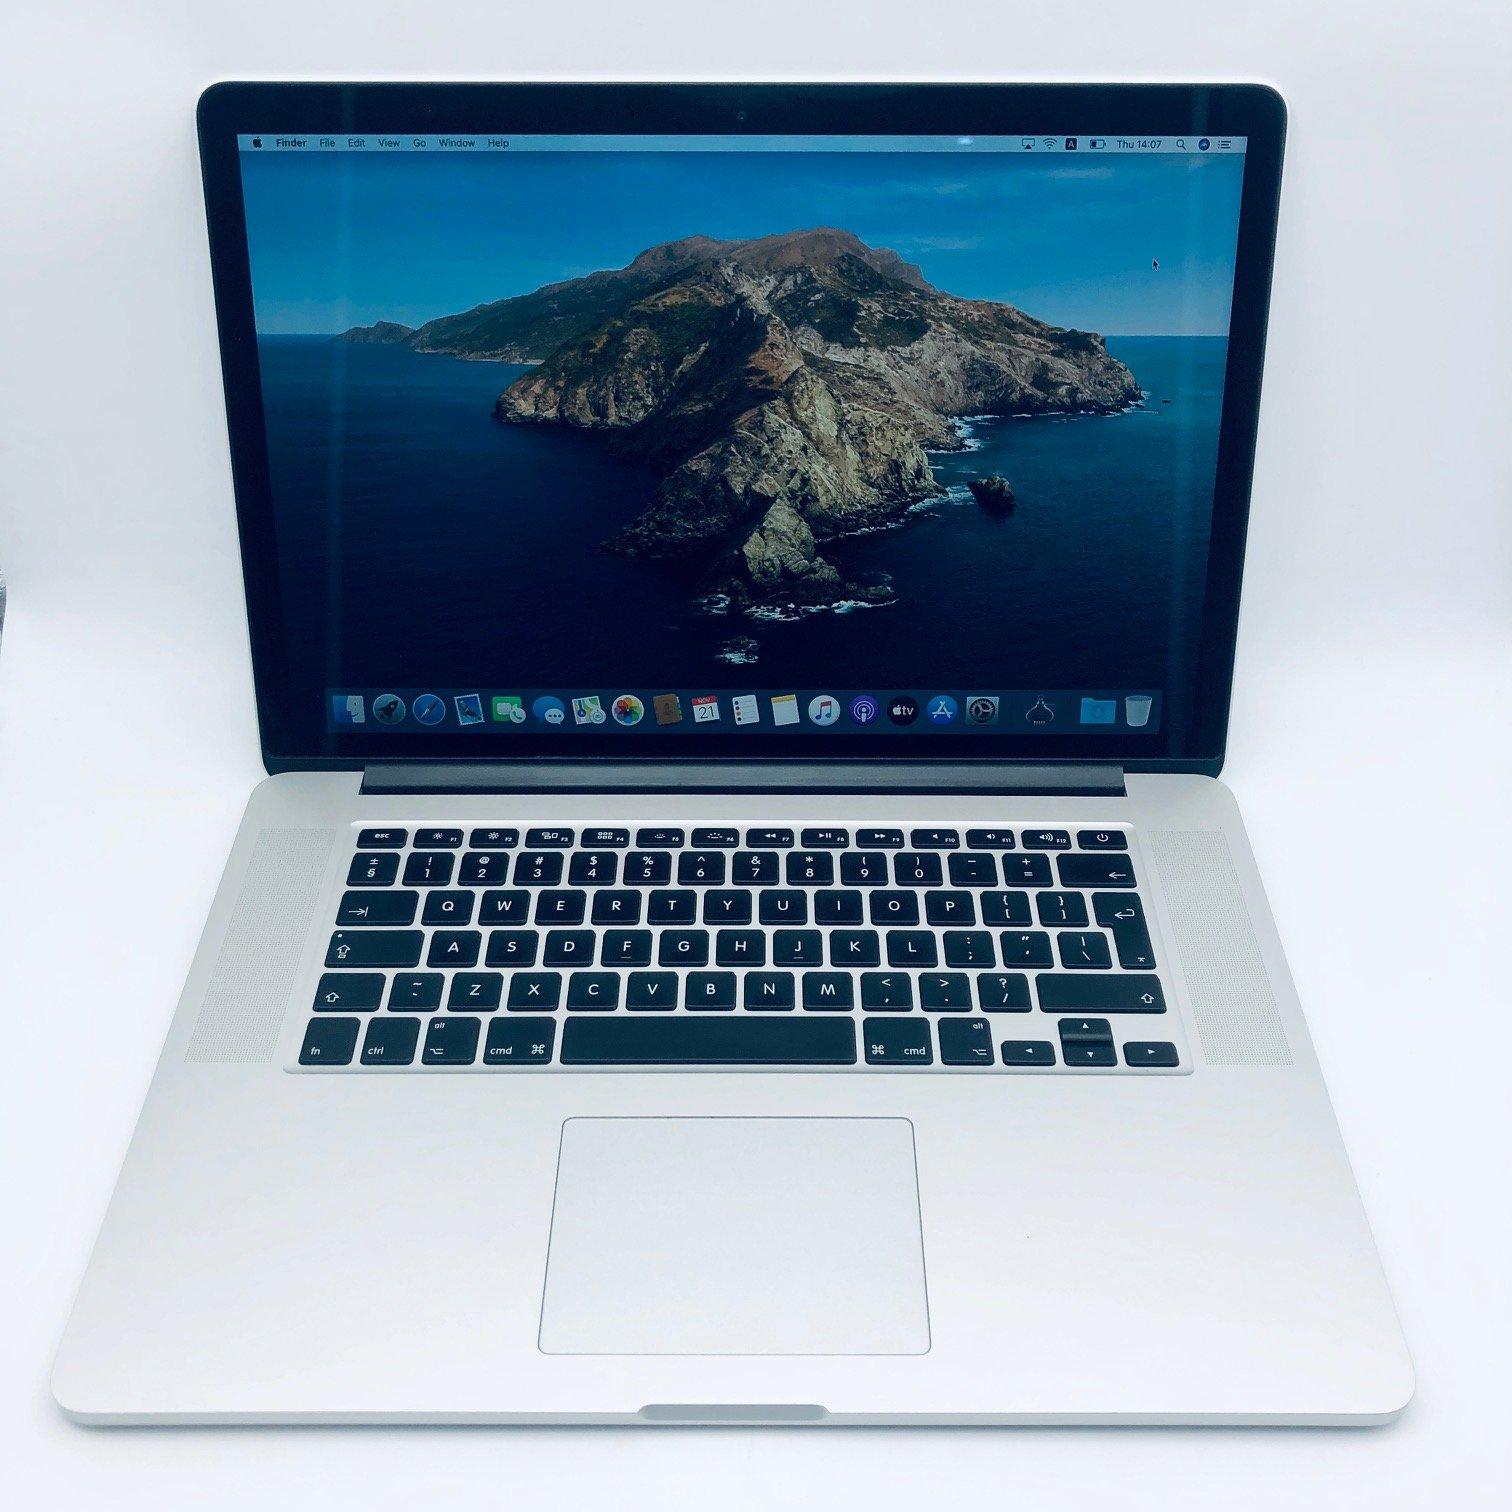 Apple MacBook Pro 15-inch 2.6GHz Quad-Core i7 (Retina, 500GB, Silver) - Pre Owned